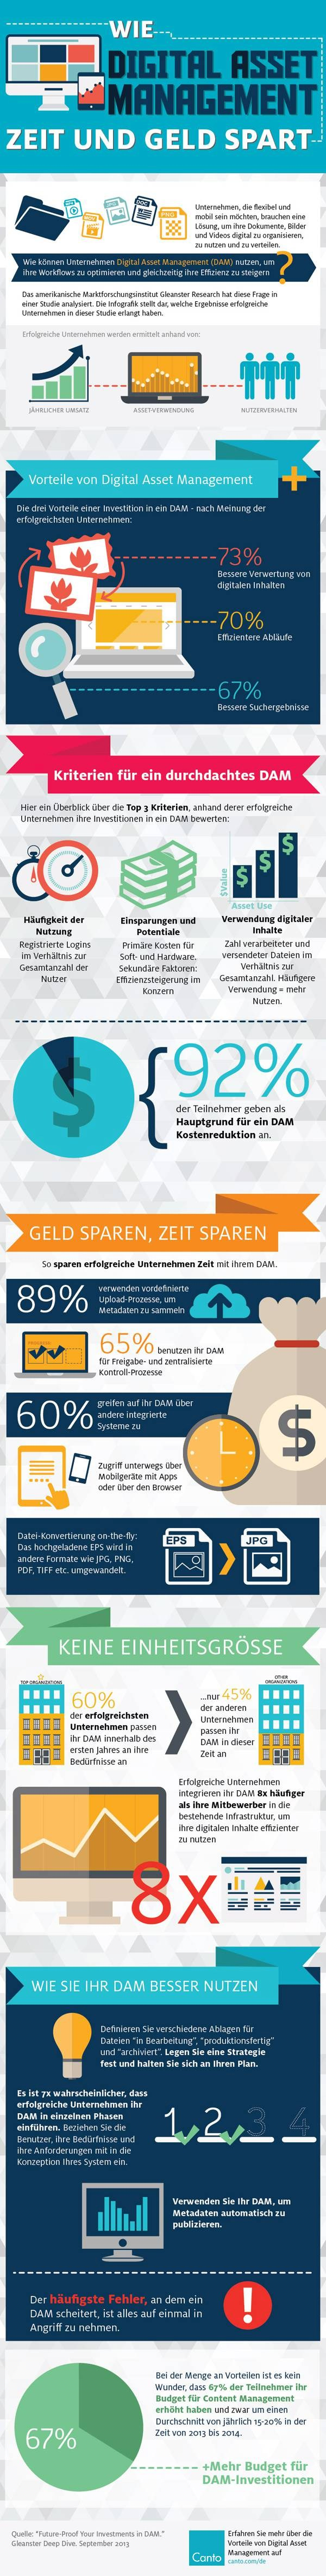 infografik canto dam-software digital asset management